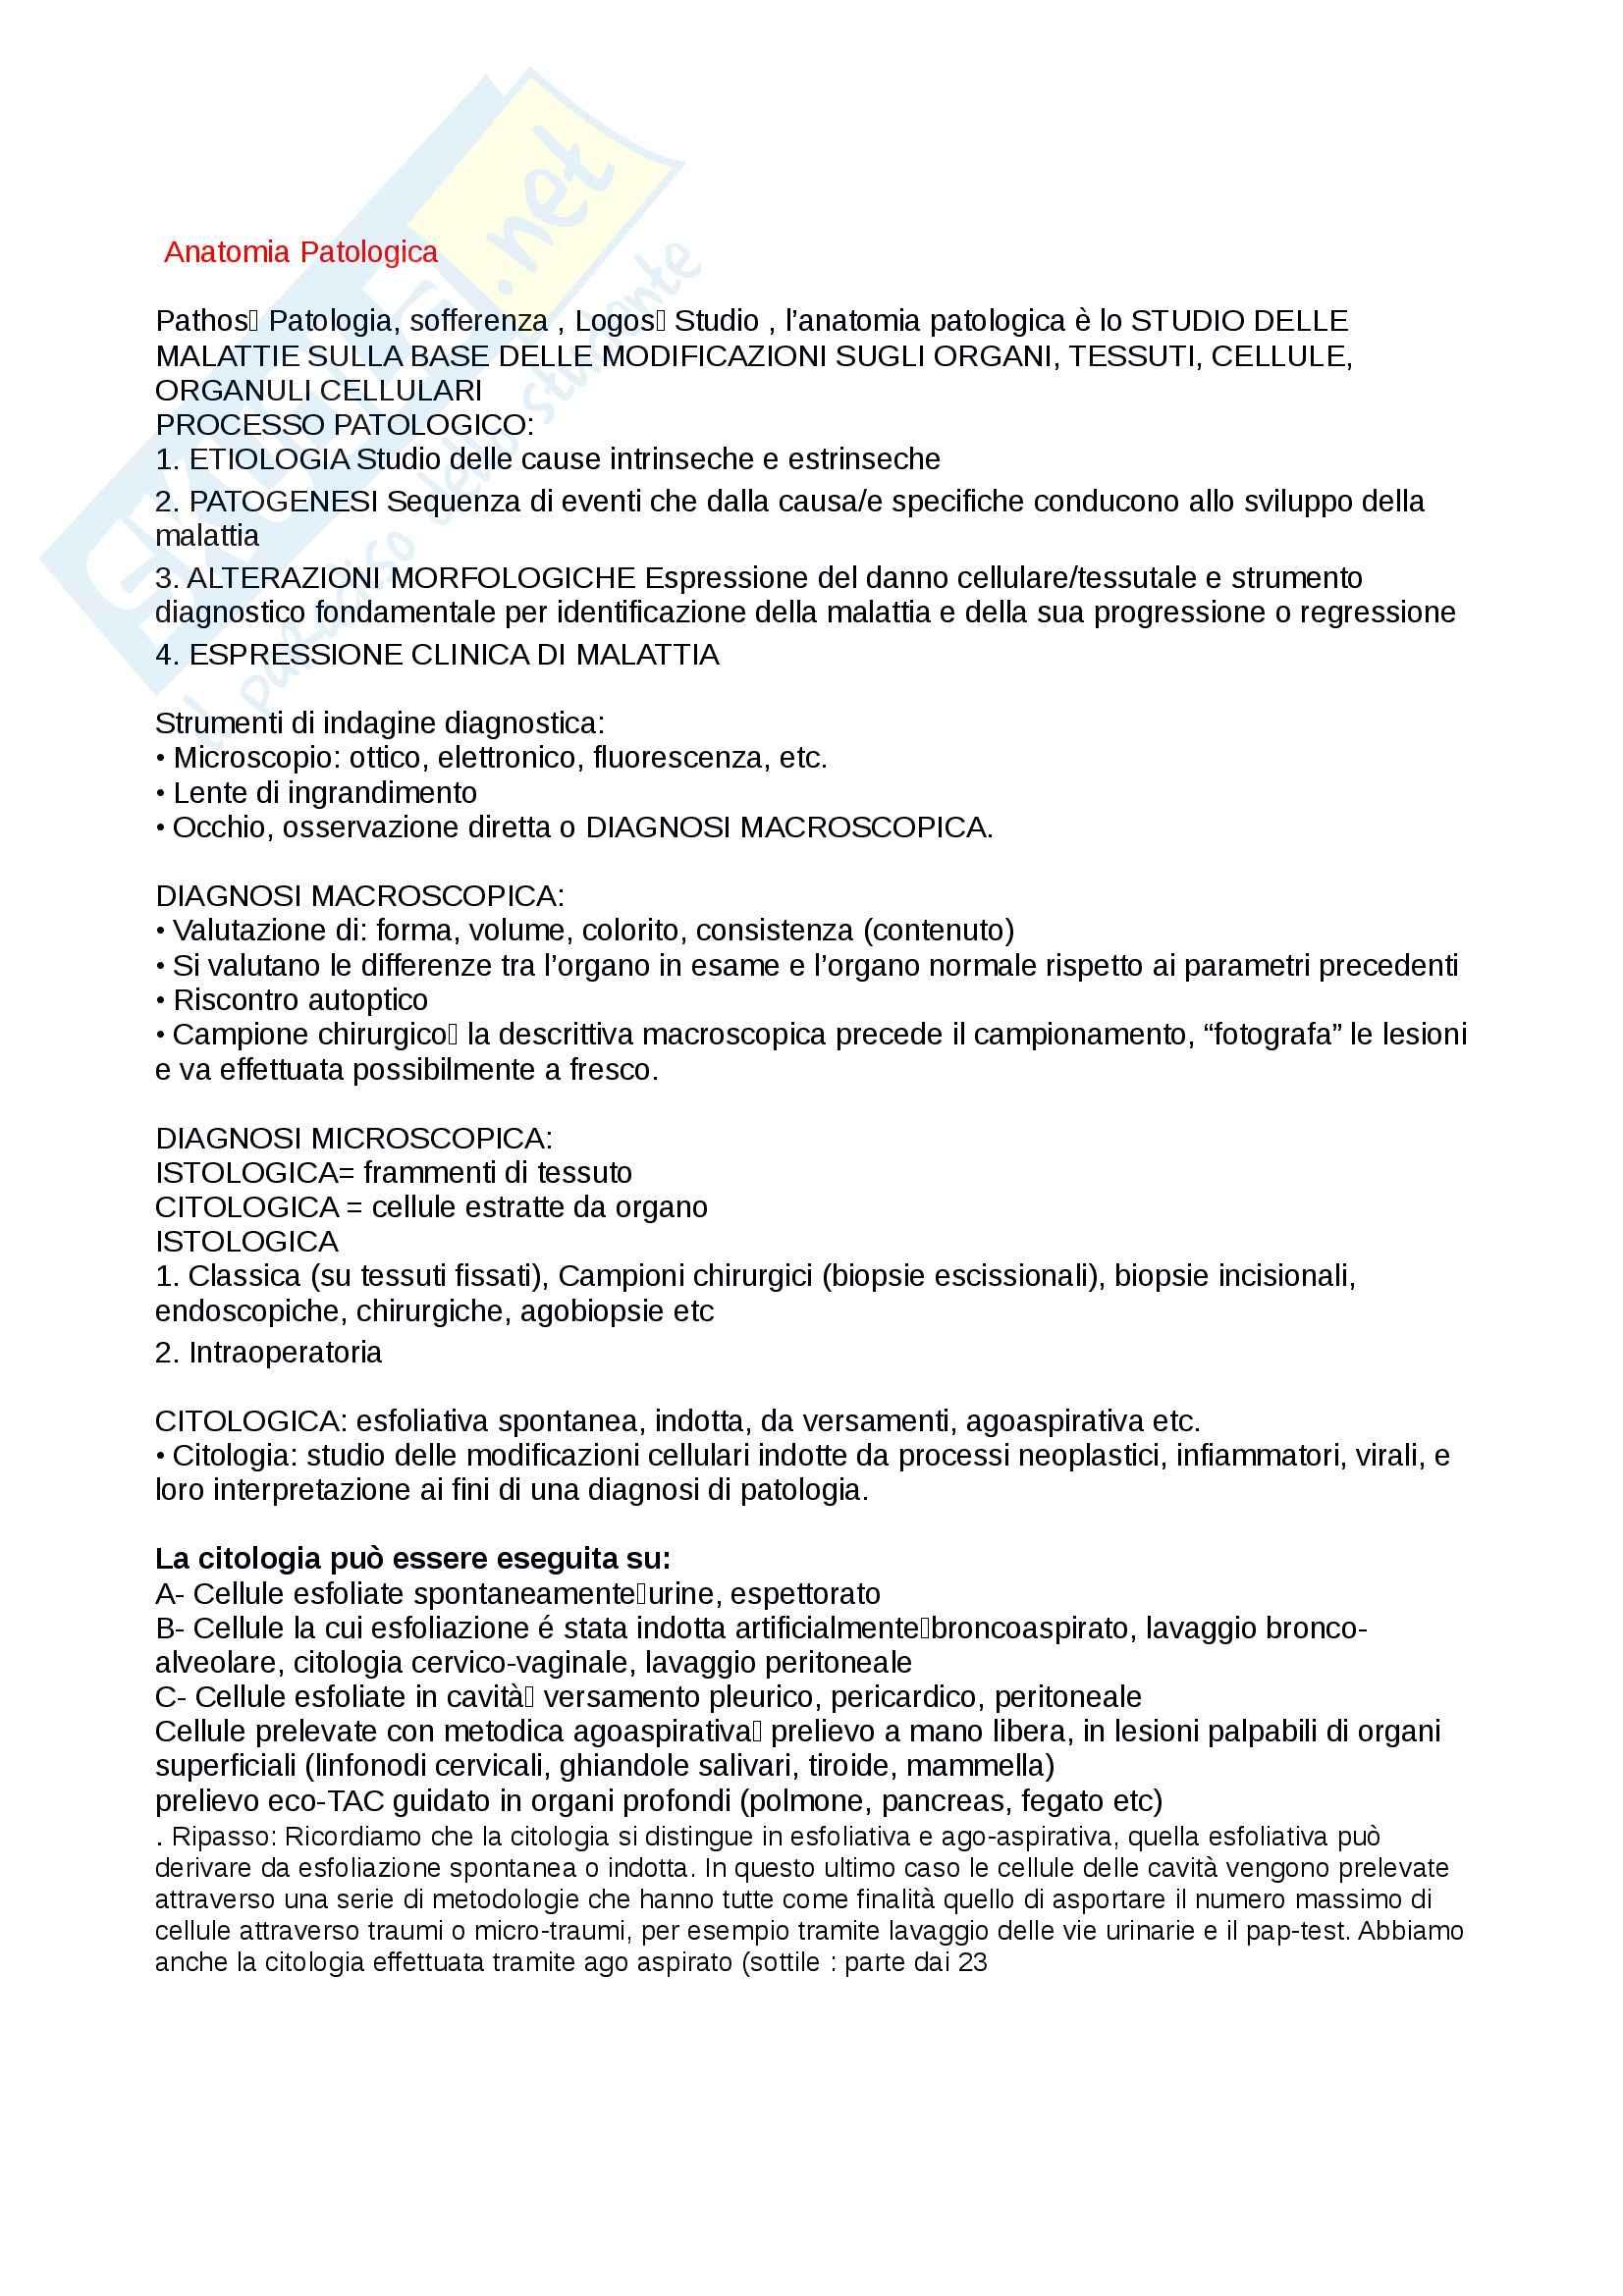 Anatomia patologica - Appunti